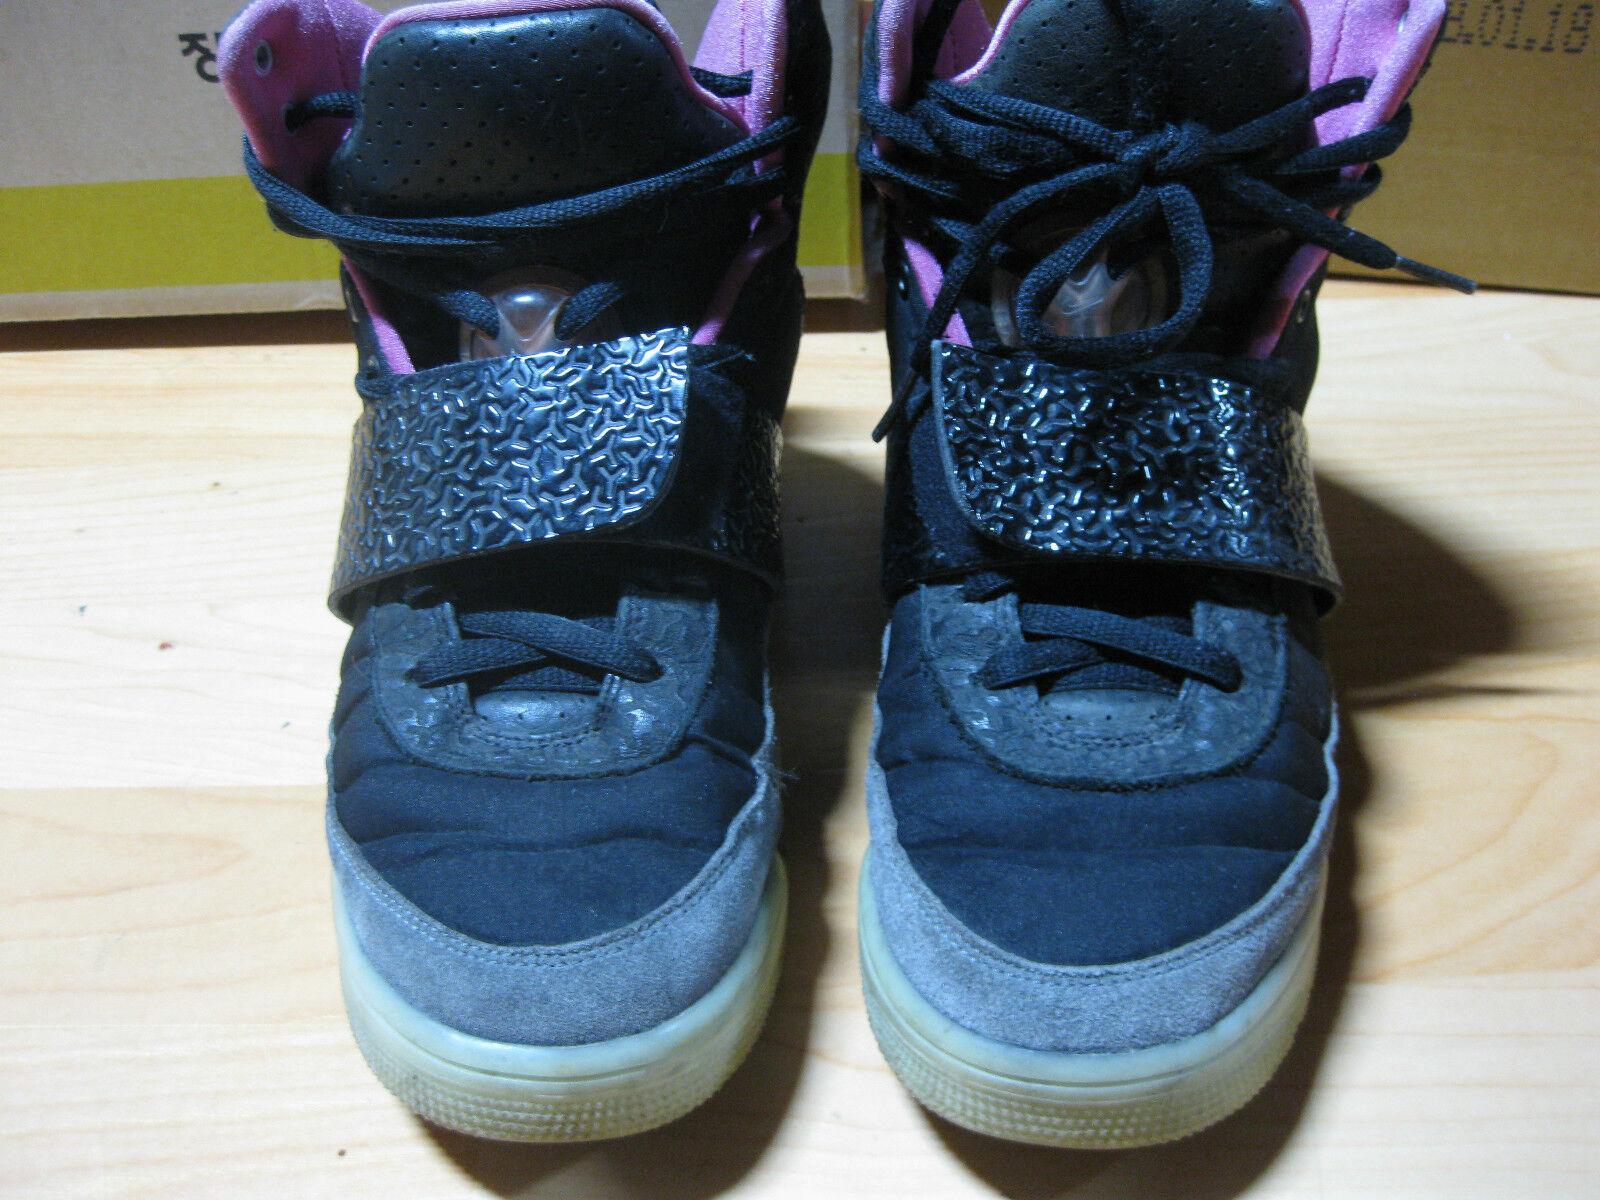 online store 4da99 90b87 ... Vapormax Flyknit Wmns 9.5 Triple Black 899472-003 Comme Des Garcons. NIKE  AIR JORDAN RETRO 12 XII GAMMA blueE GS US 4.5Y BLACK TAXI Search  Nike Air  ...